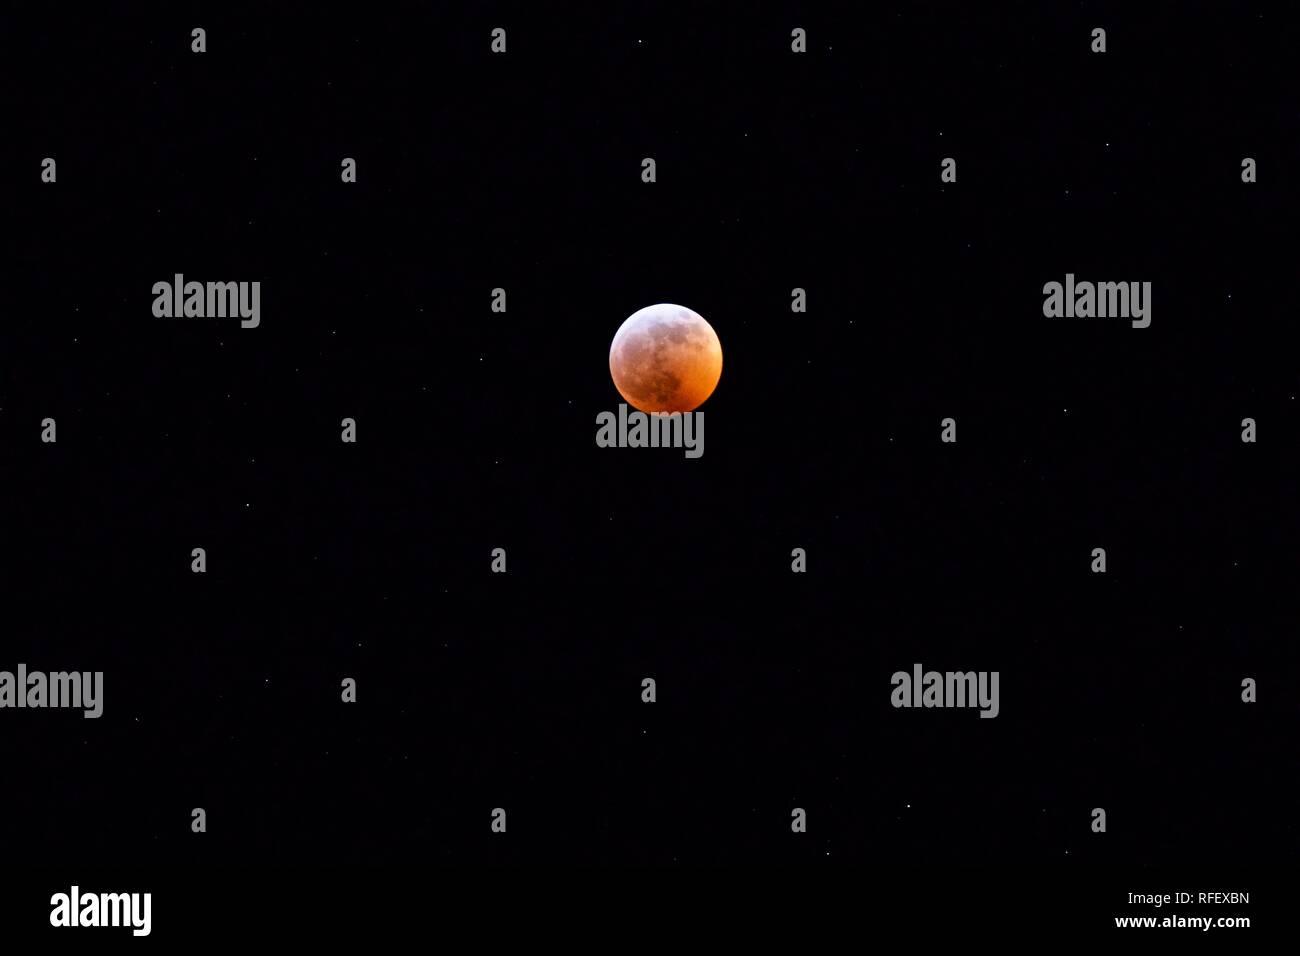 Lunar Eclipse - Super Wolf Blood Moon - Stock Image